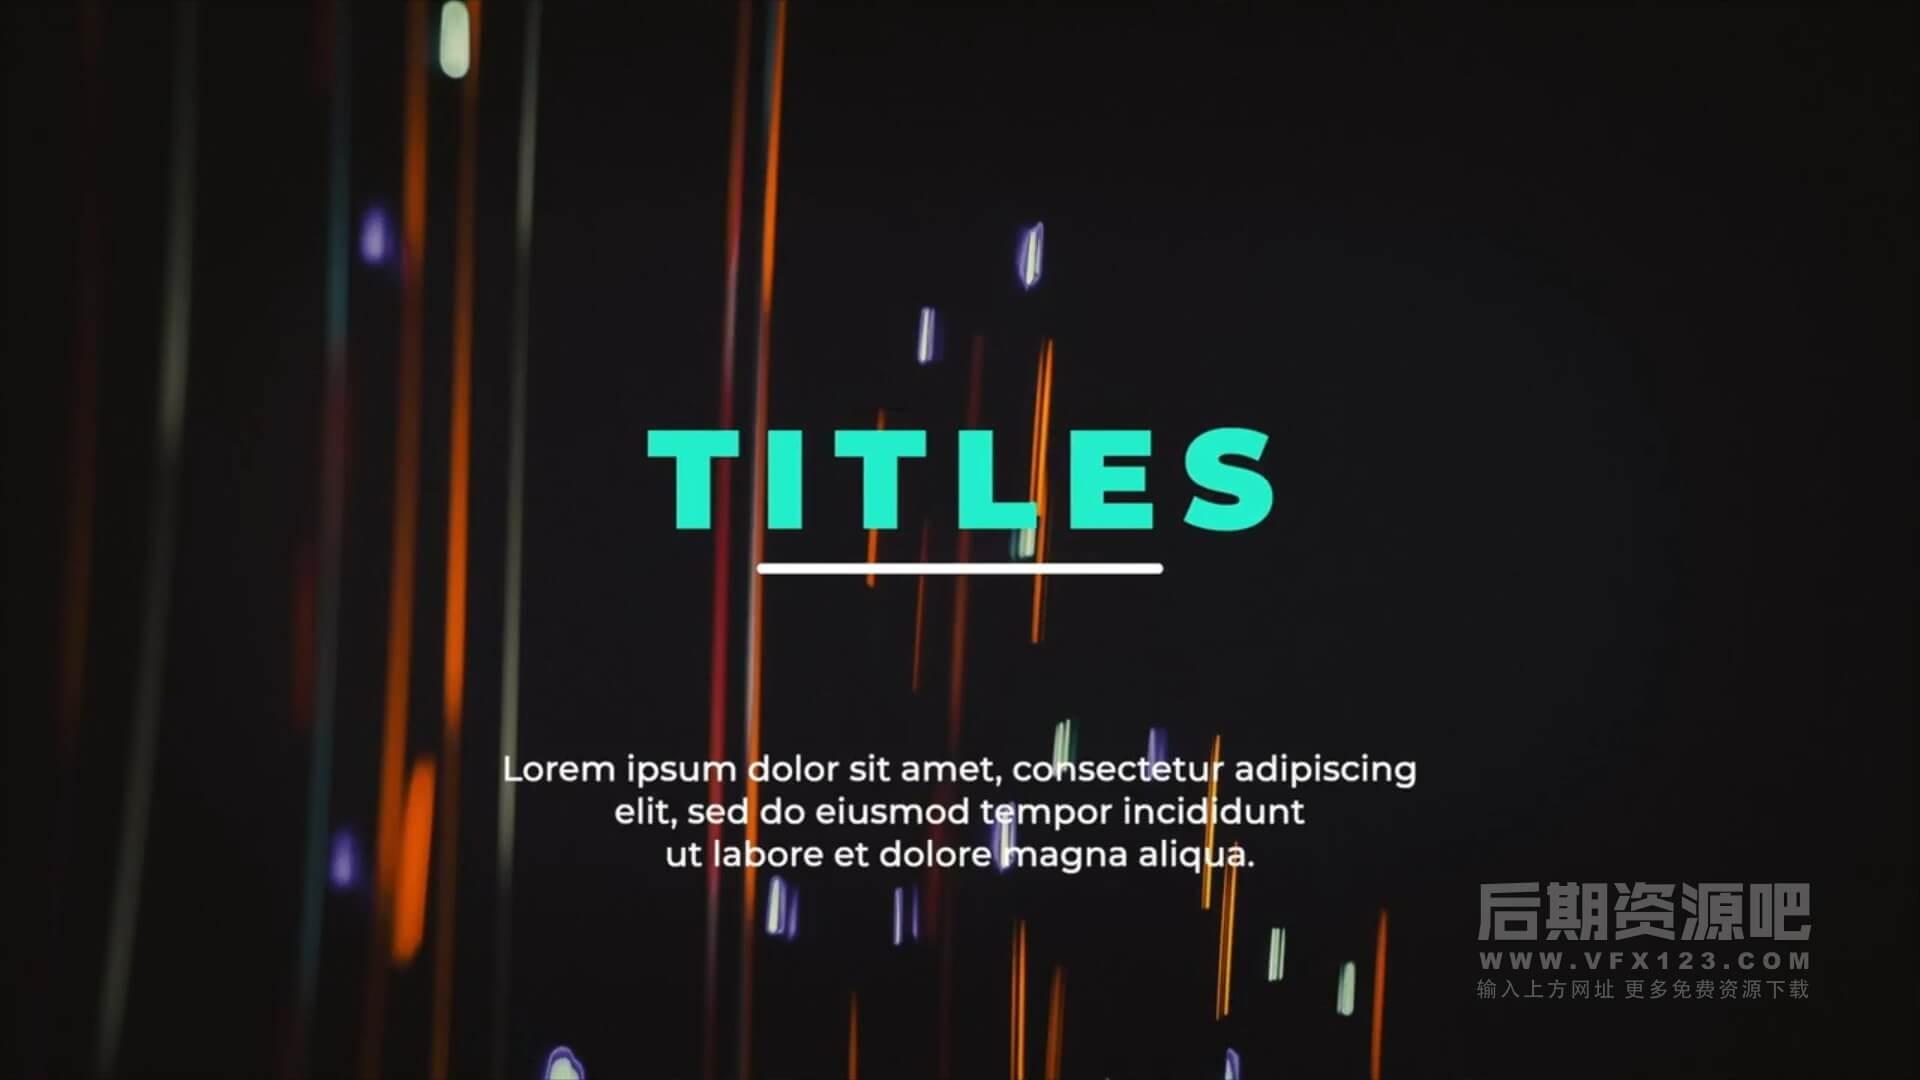 fcpx插件 16组版式设计标题模板侧边栏动画 Typography